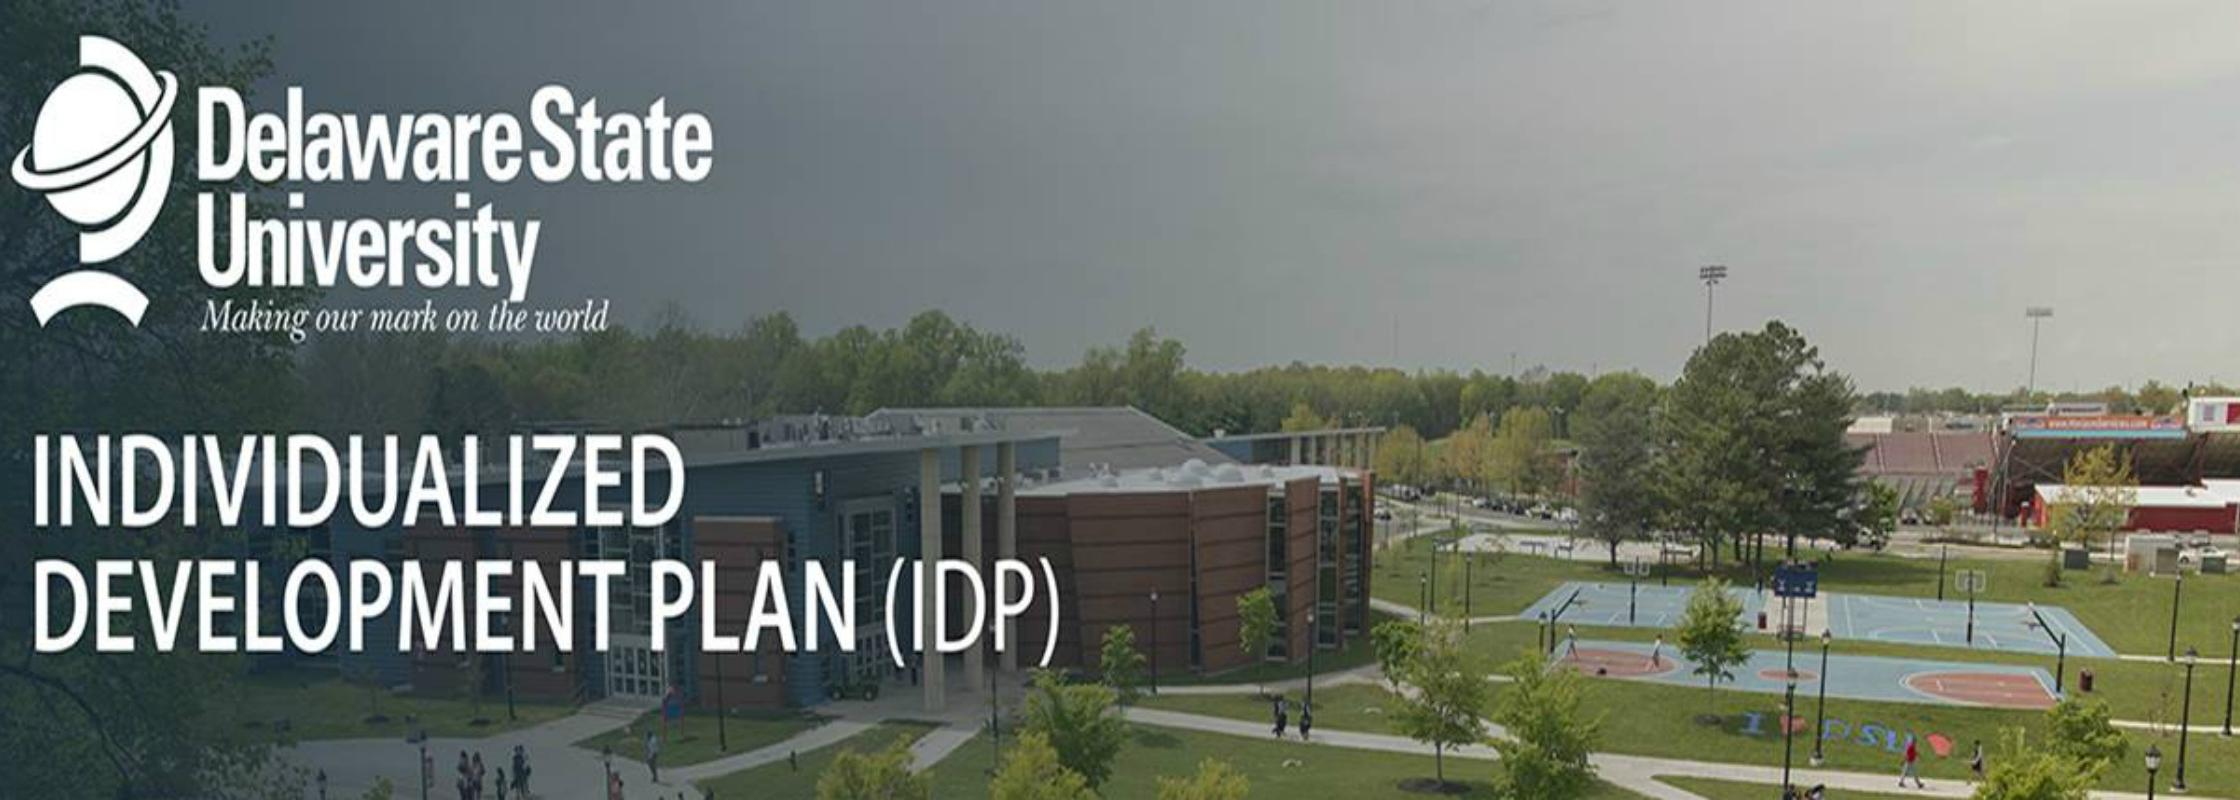 IDP Banner Image